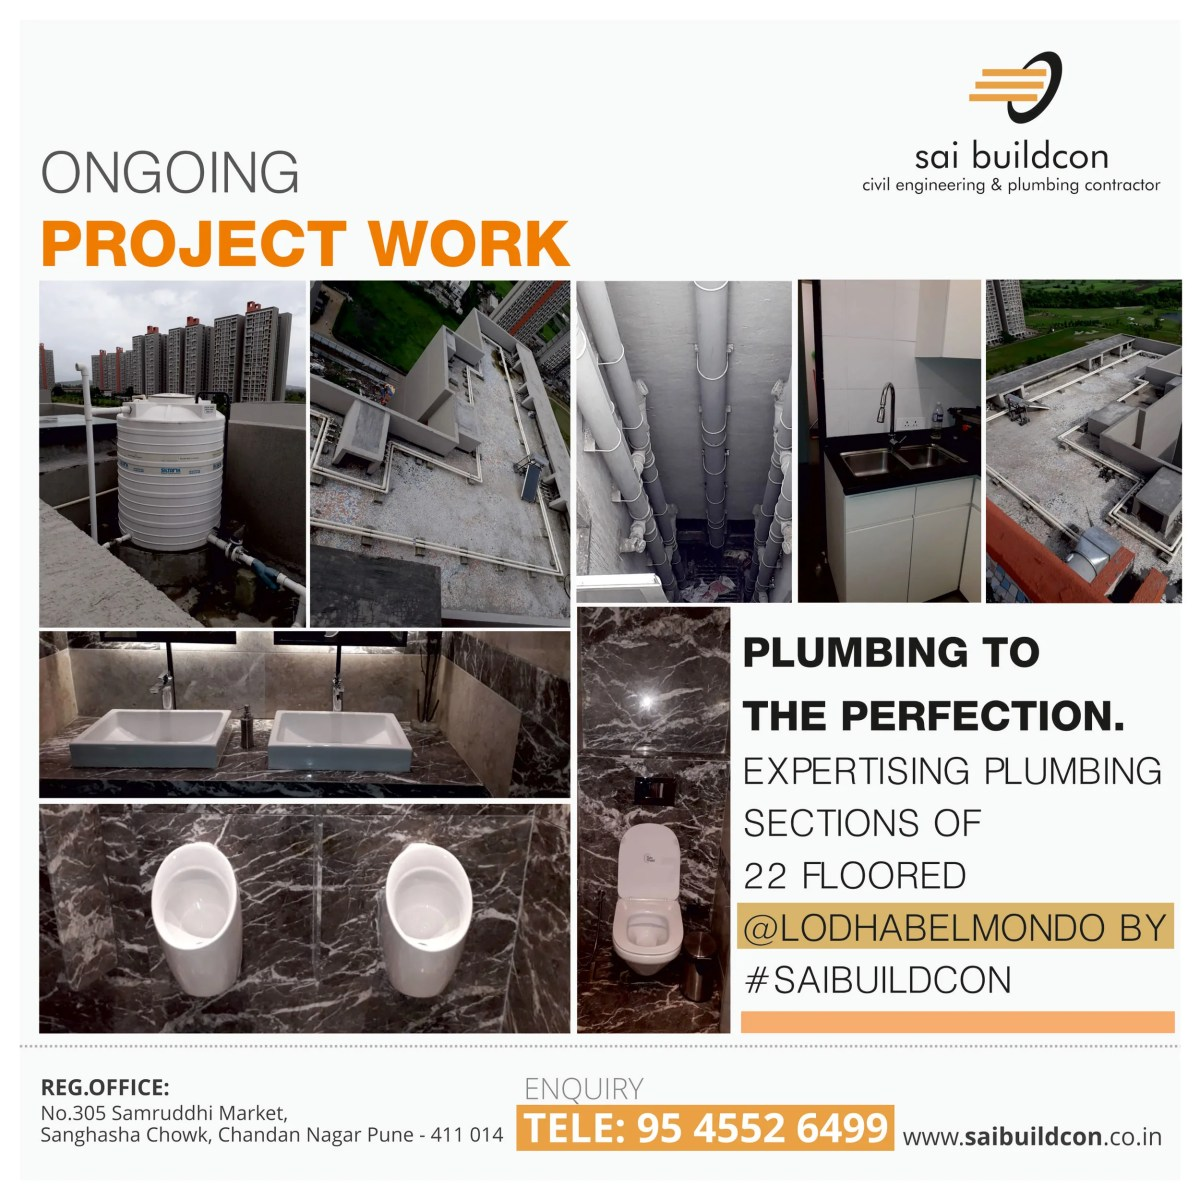 24-July-2018 Project Work Ongoing at Lodha Belmondo